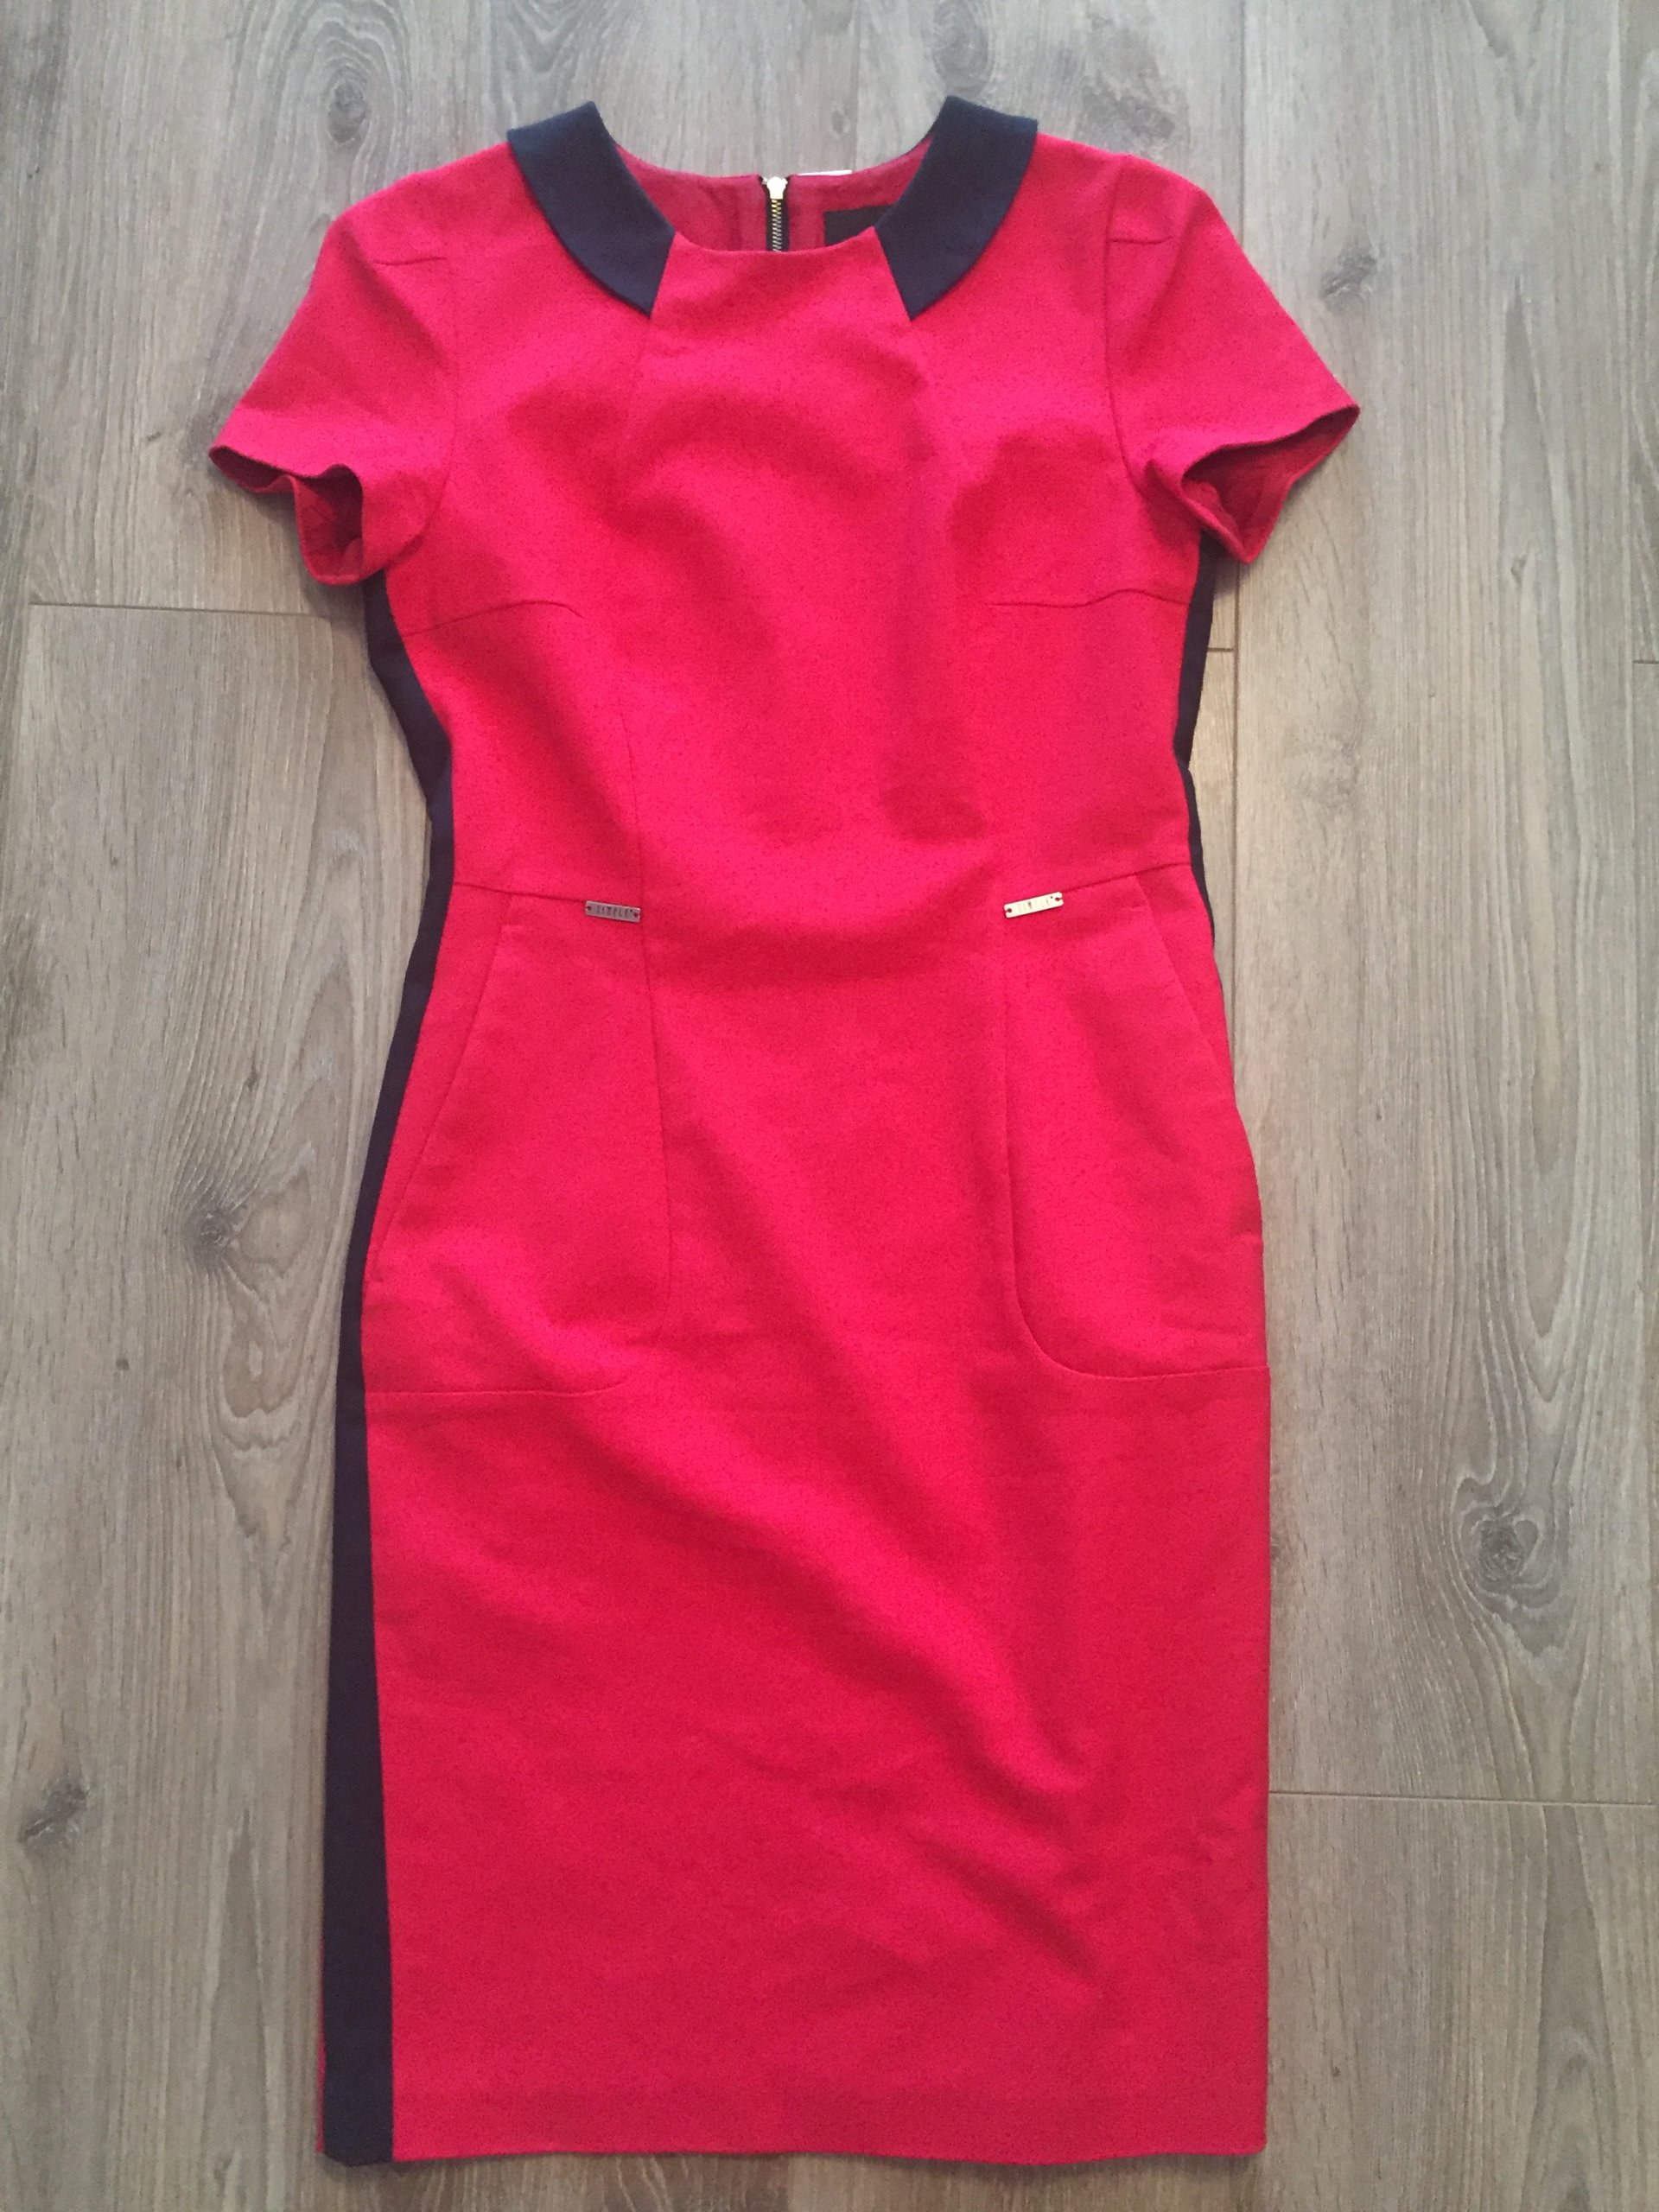 1ad24f10e8 Sukienka Simple 38 M ołówkowa elegancka - 7367747825 - oficjalne ...